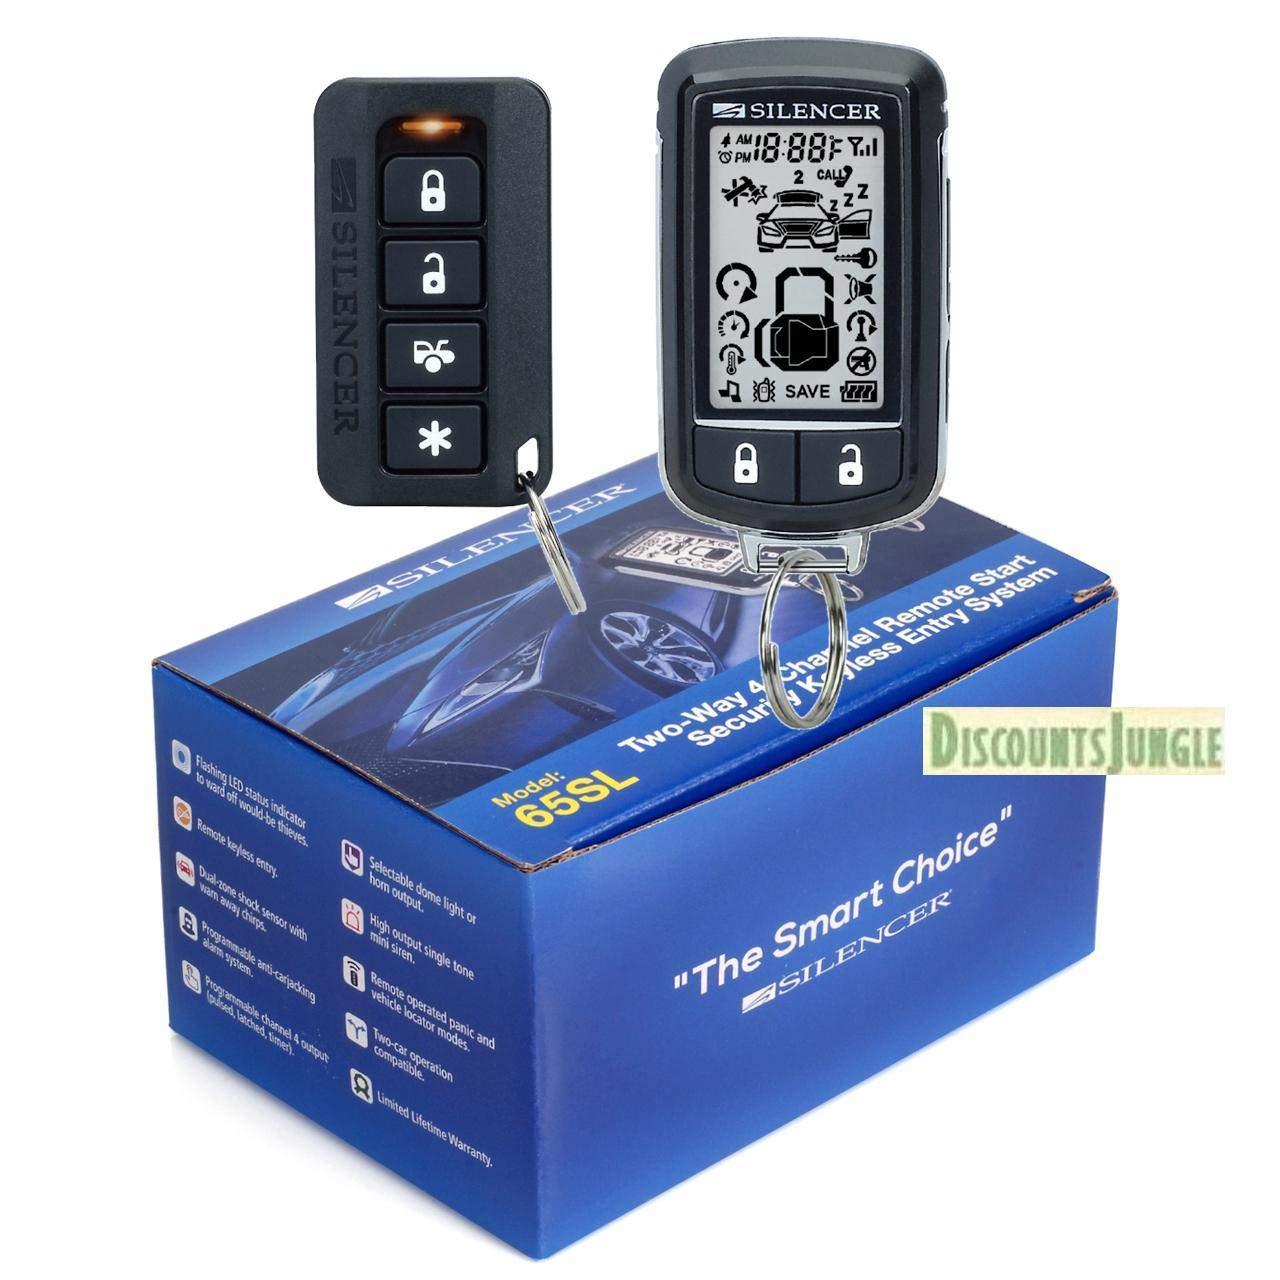 Silencer SILENCER 65SL Long Range Two-Way 4- Channel Remote Start & Full CAR Alarm System by Silencer